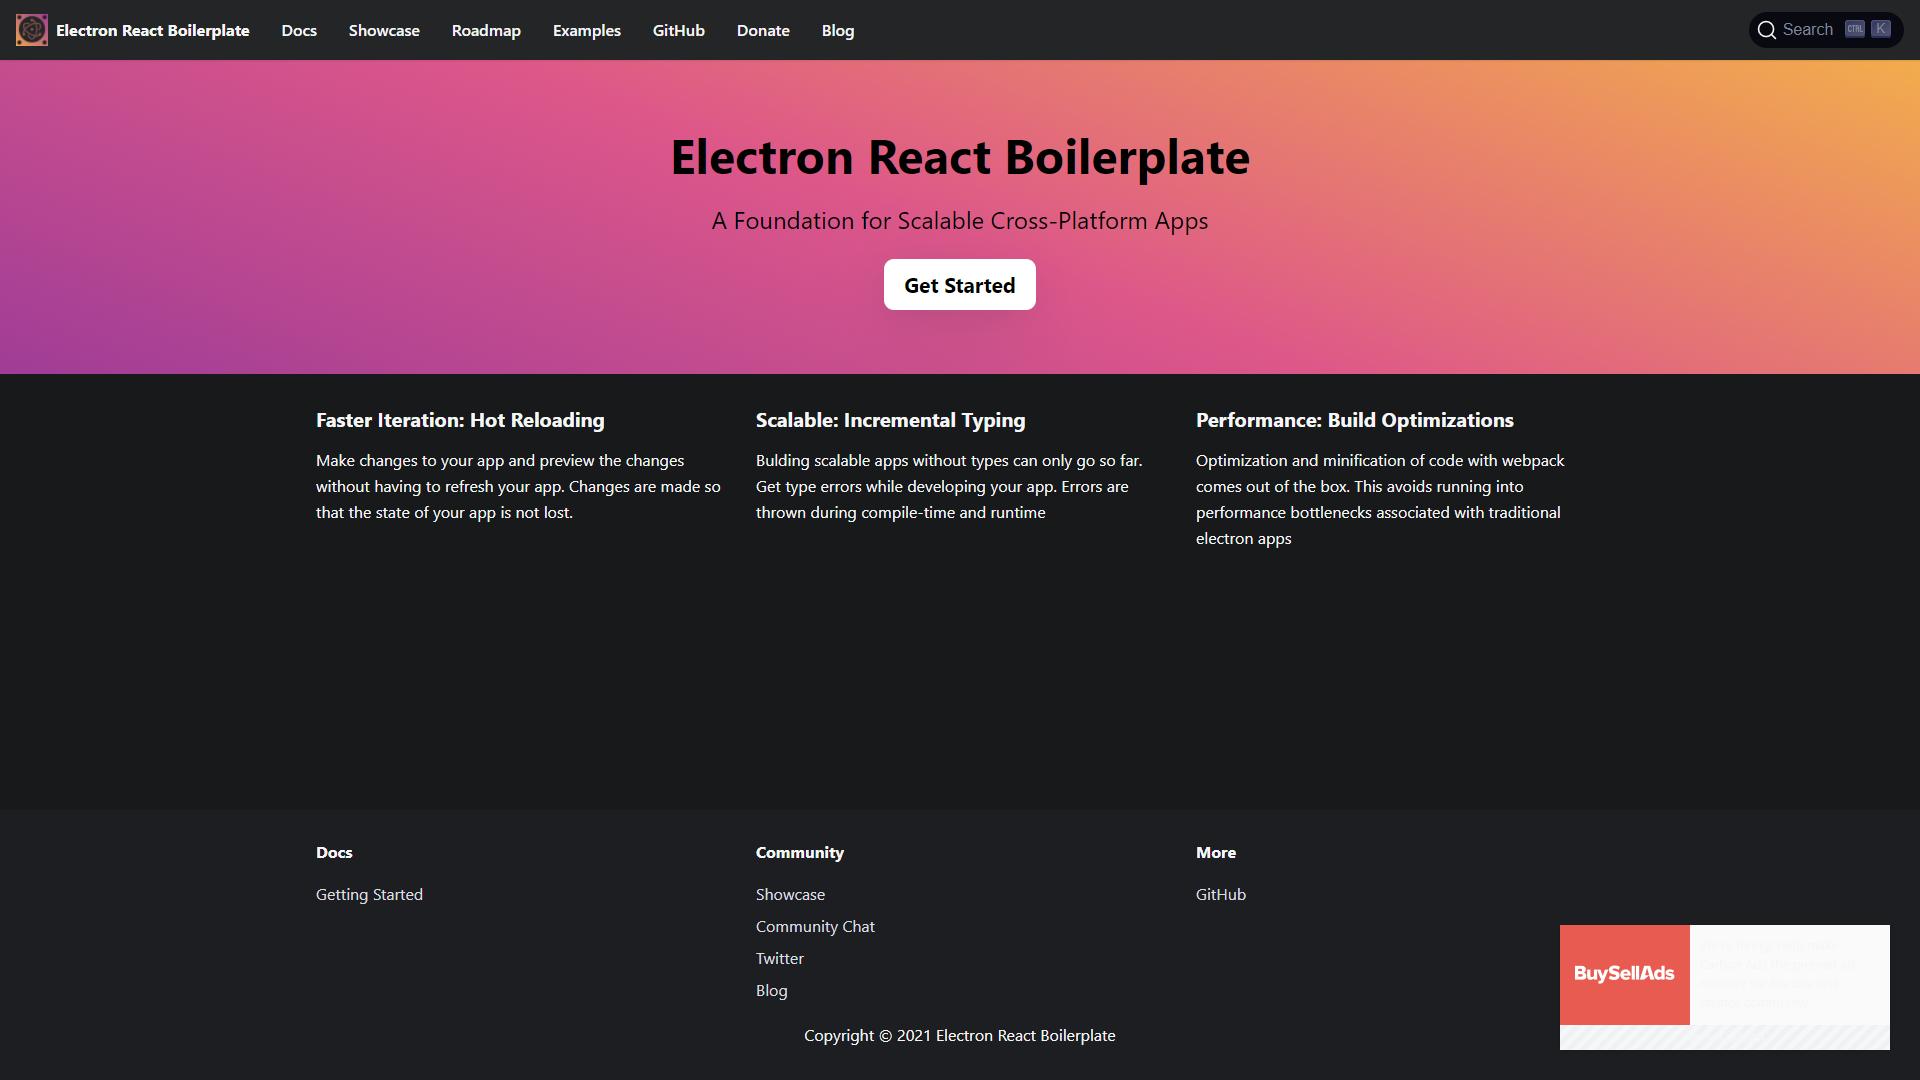 Electron React bolilerplate